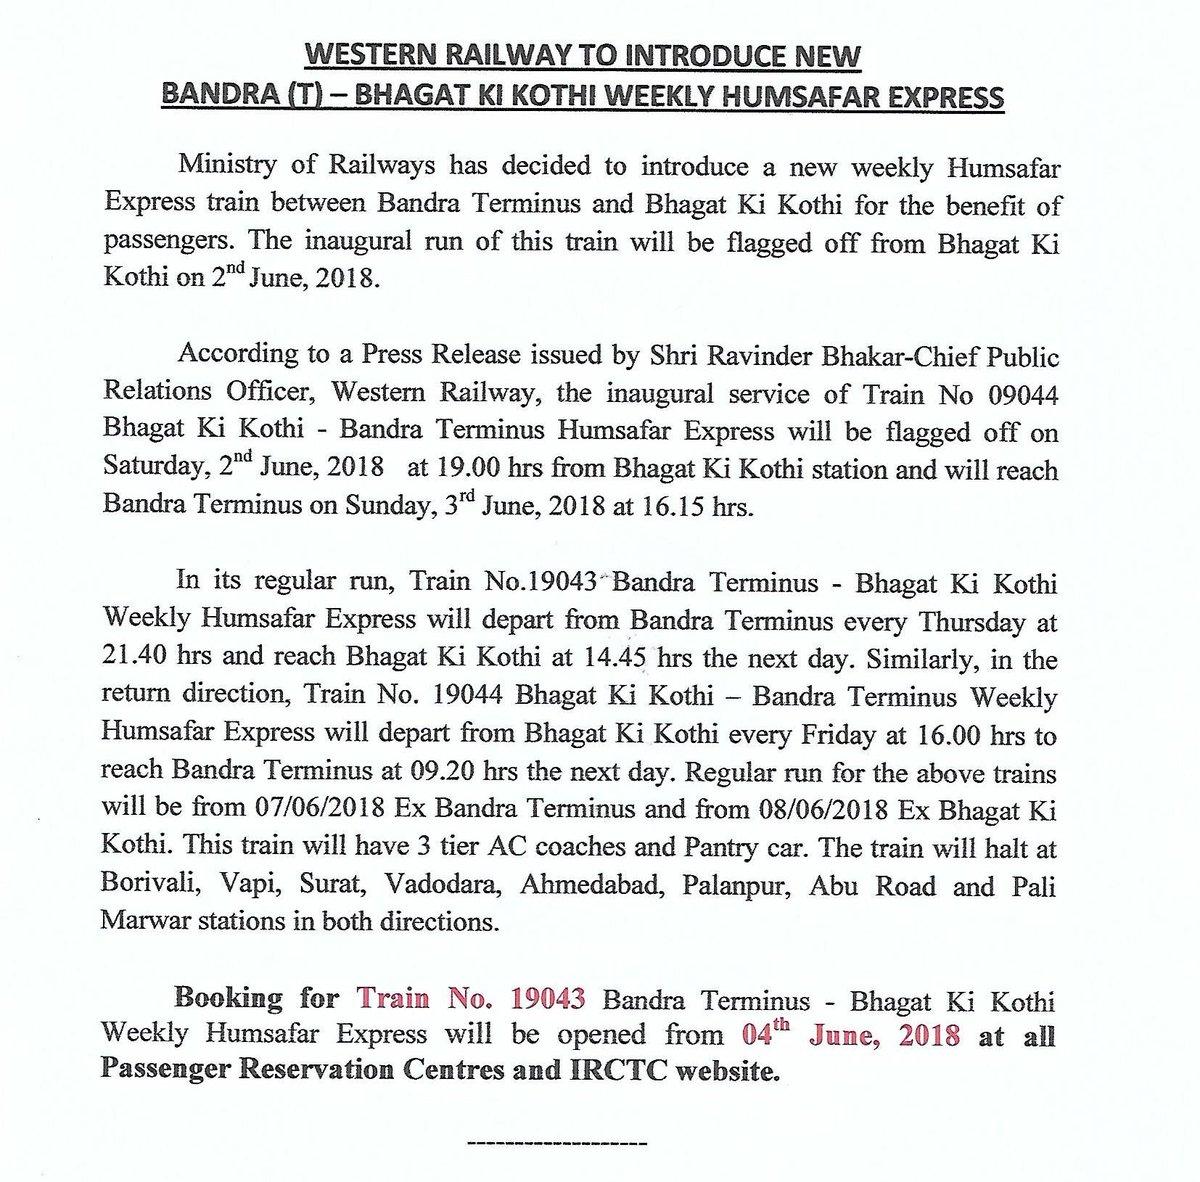 Western Railway to launch a new train today between Bandra and Bhagat ki Kothi through Gujarat